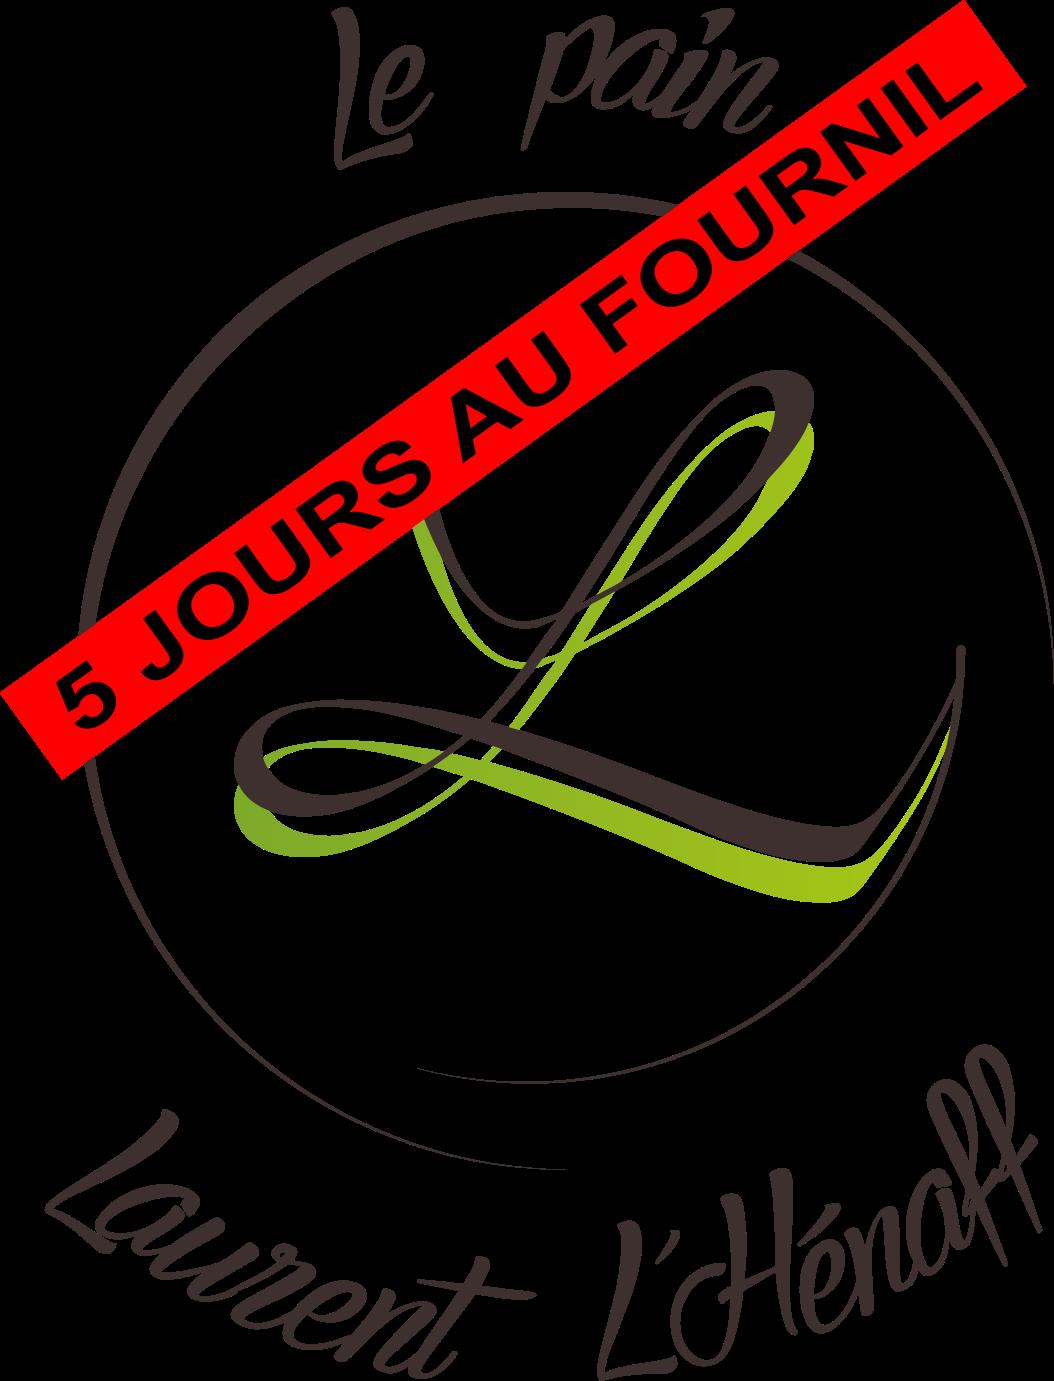 Logo_Le_Pain_Laurent_L_he_naff_5j_fournil-1495063337.png